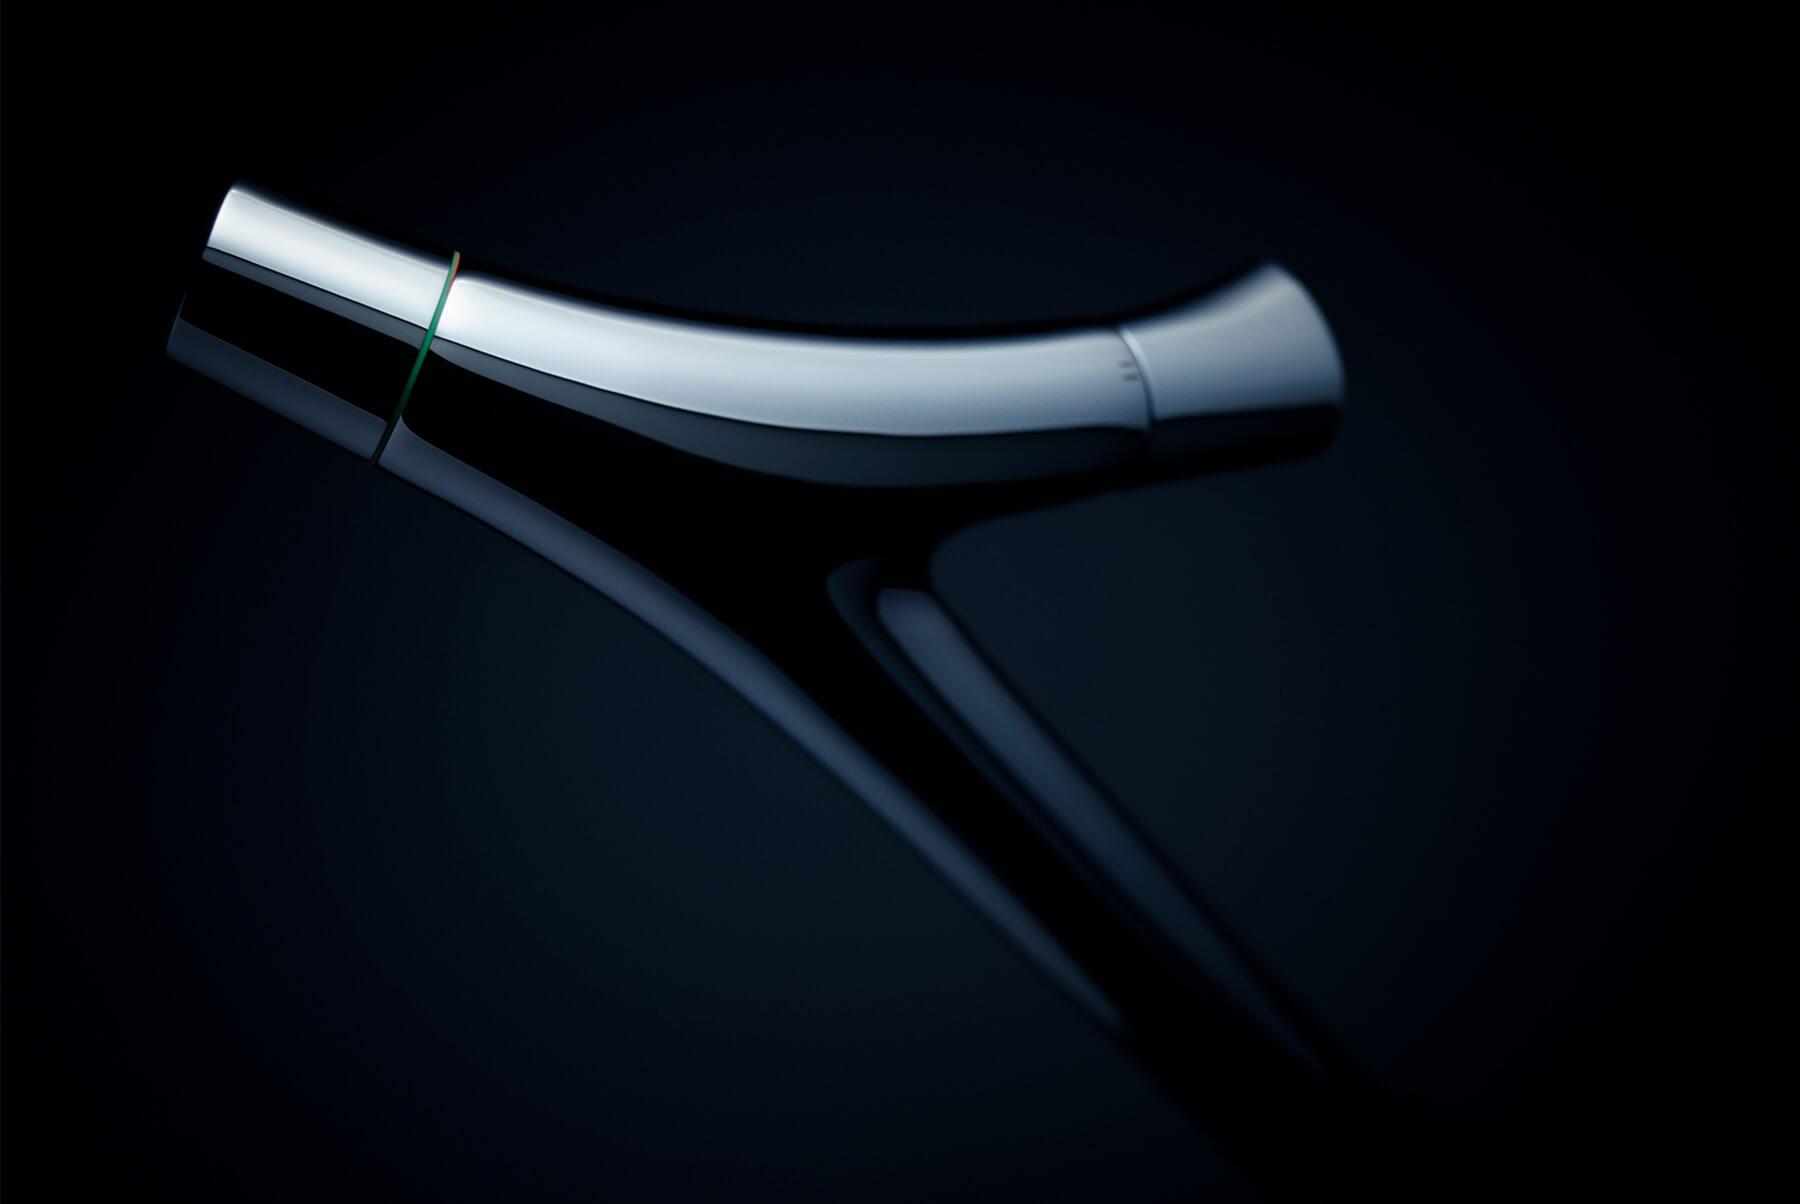 Brassware-AXOR-Stark-Organic-Inset-1-1800x1204